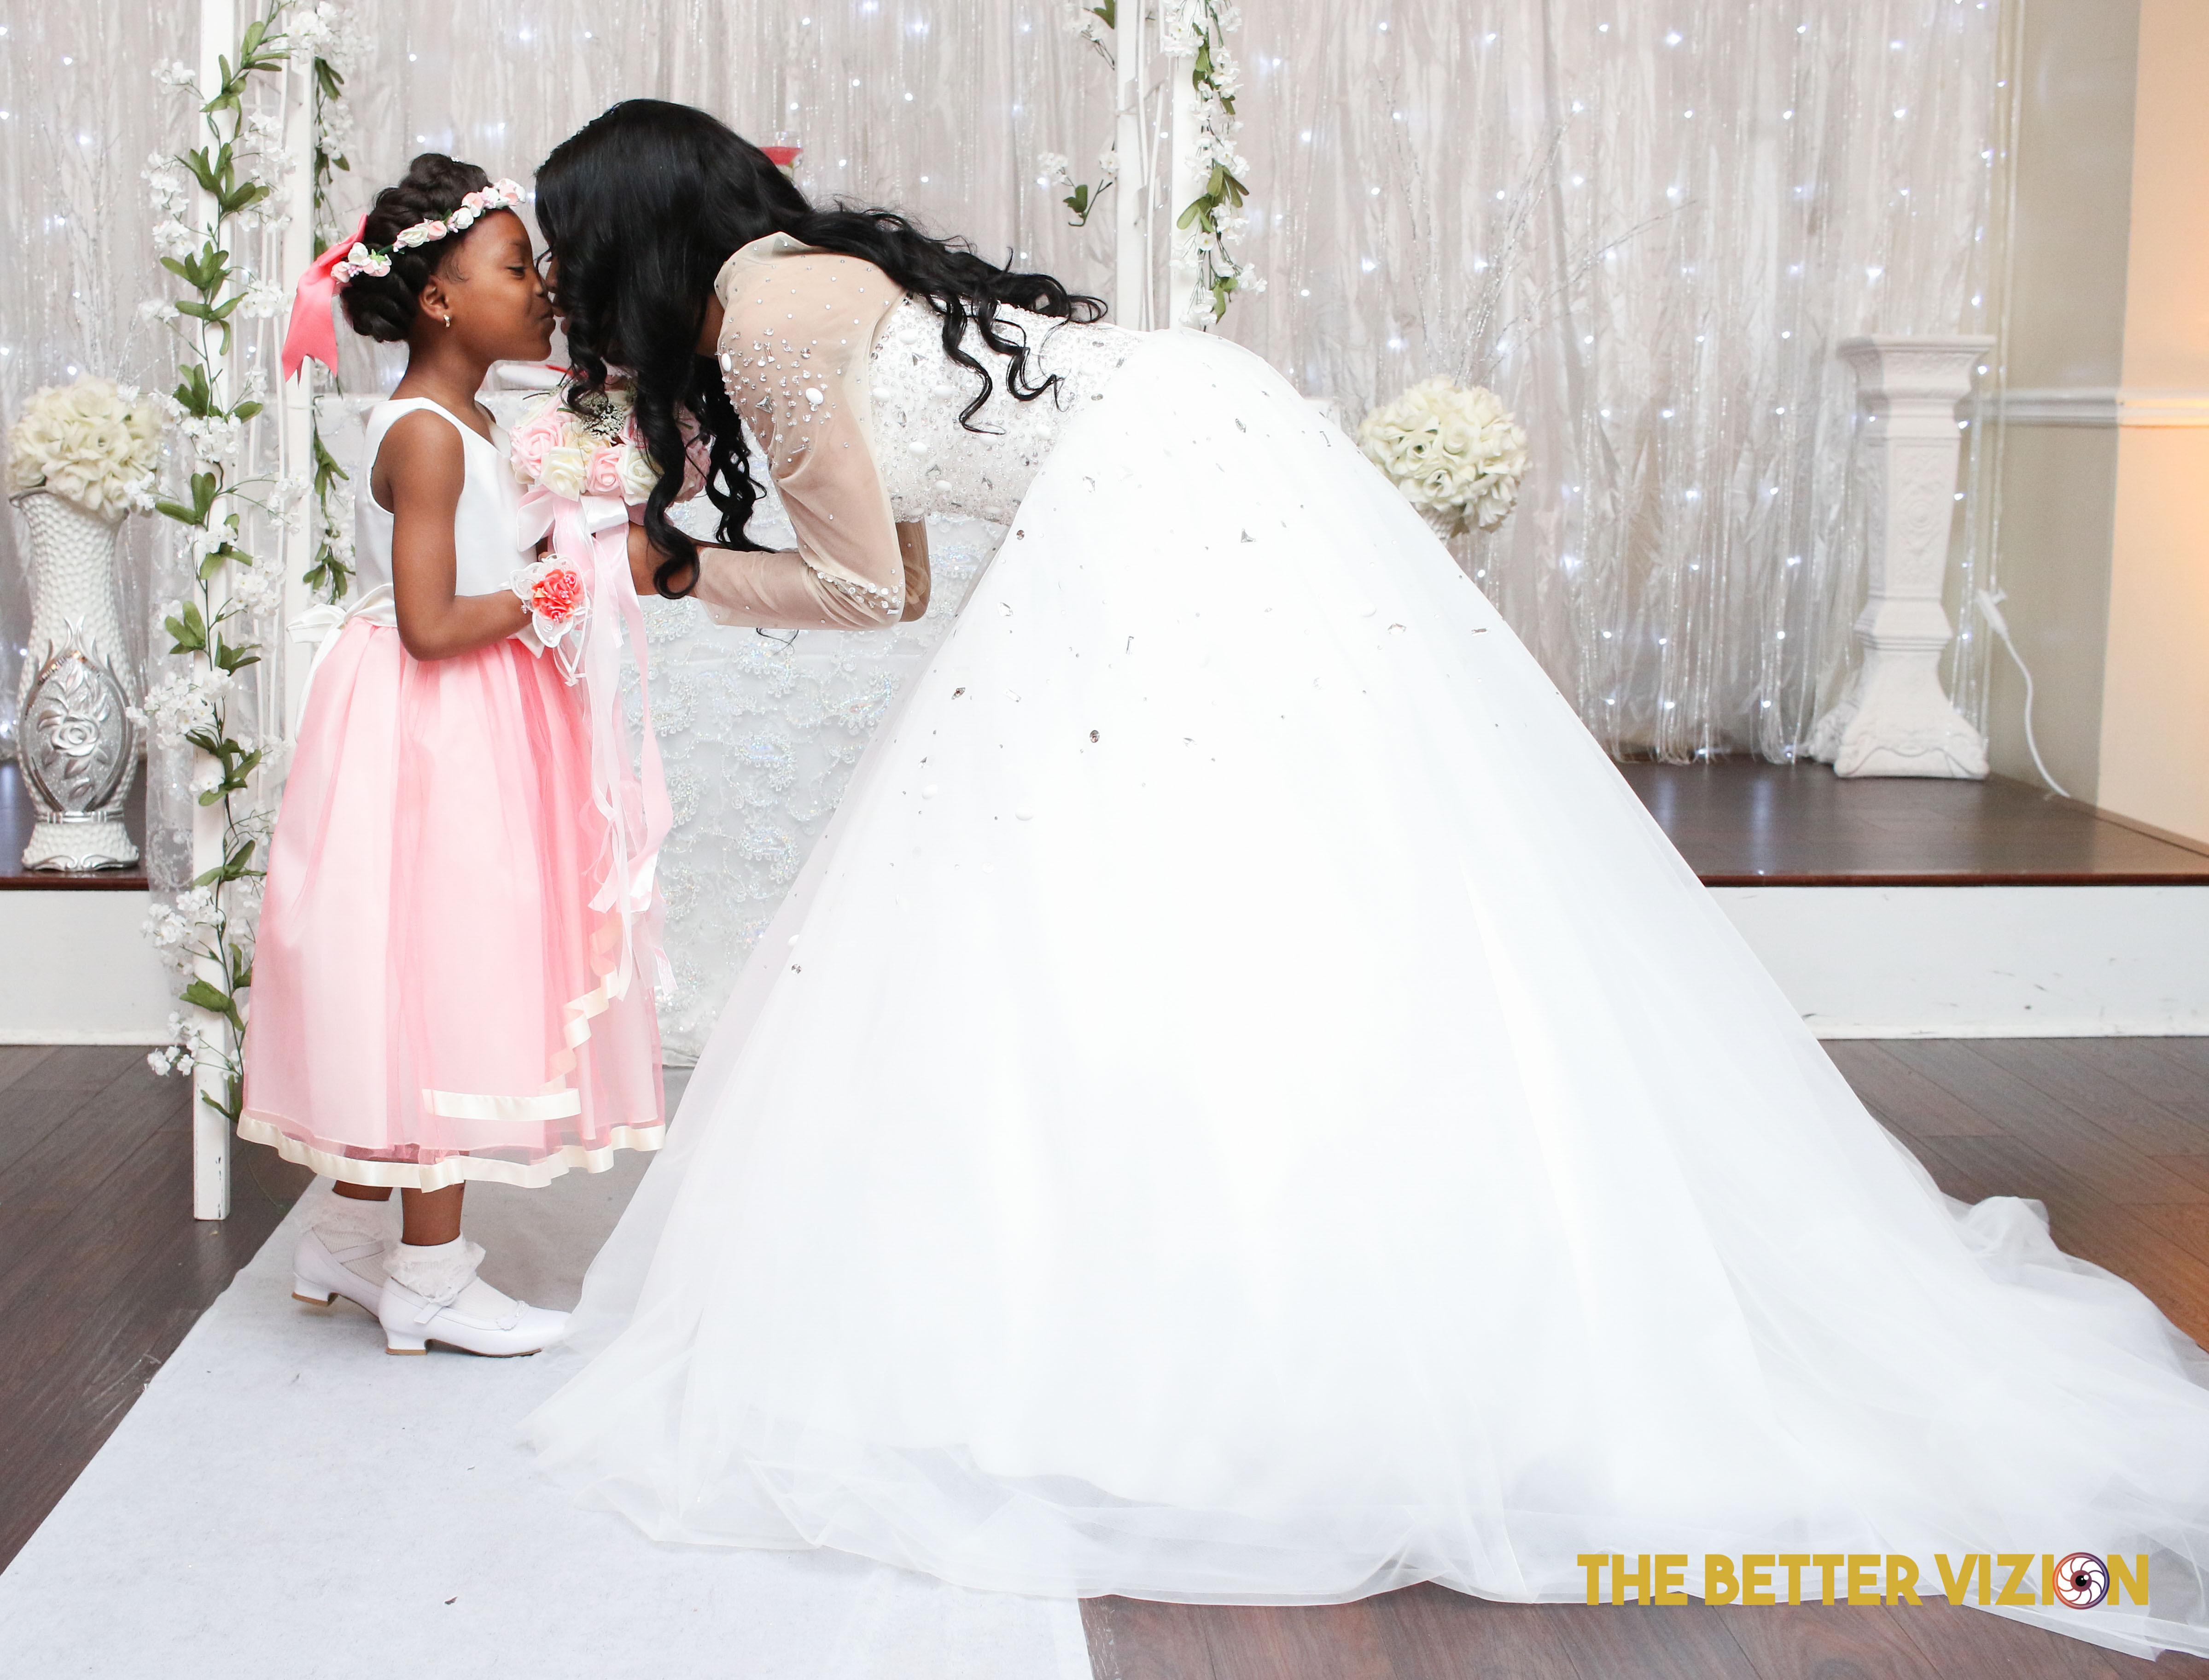 Premium Vizion Wedding Package